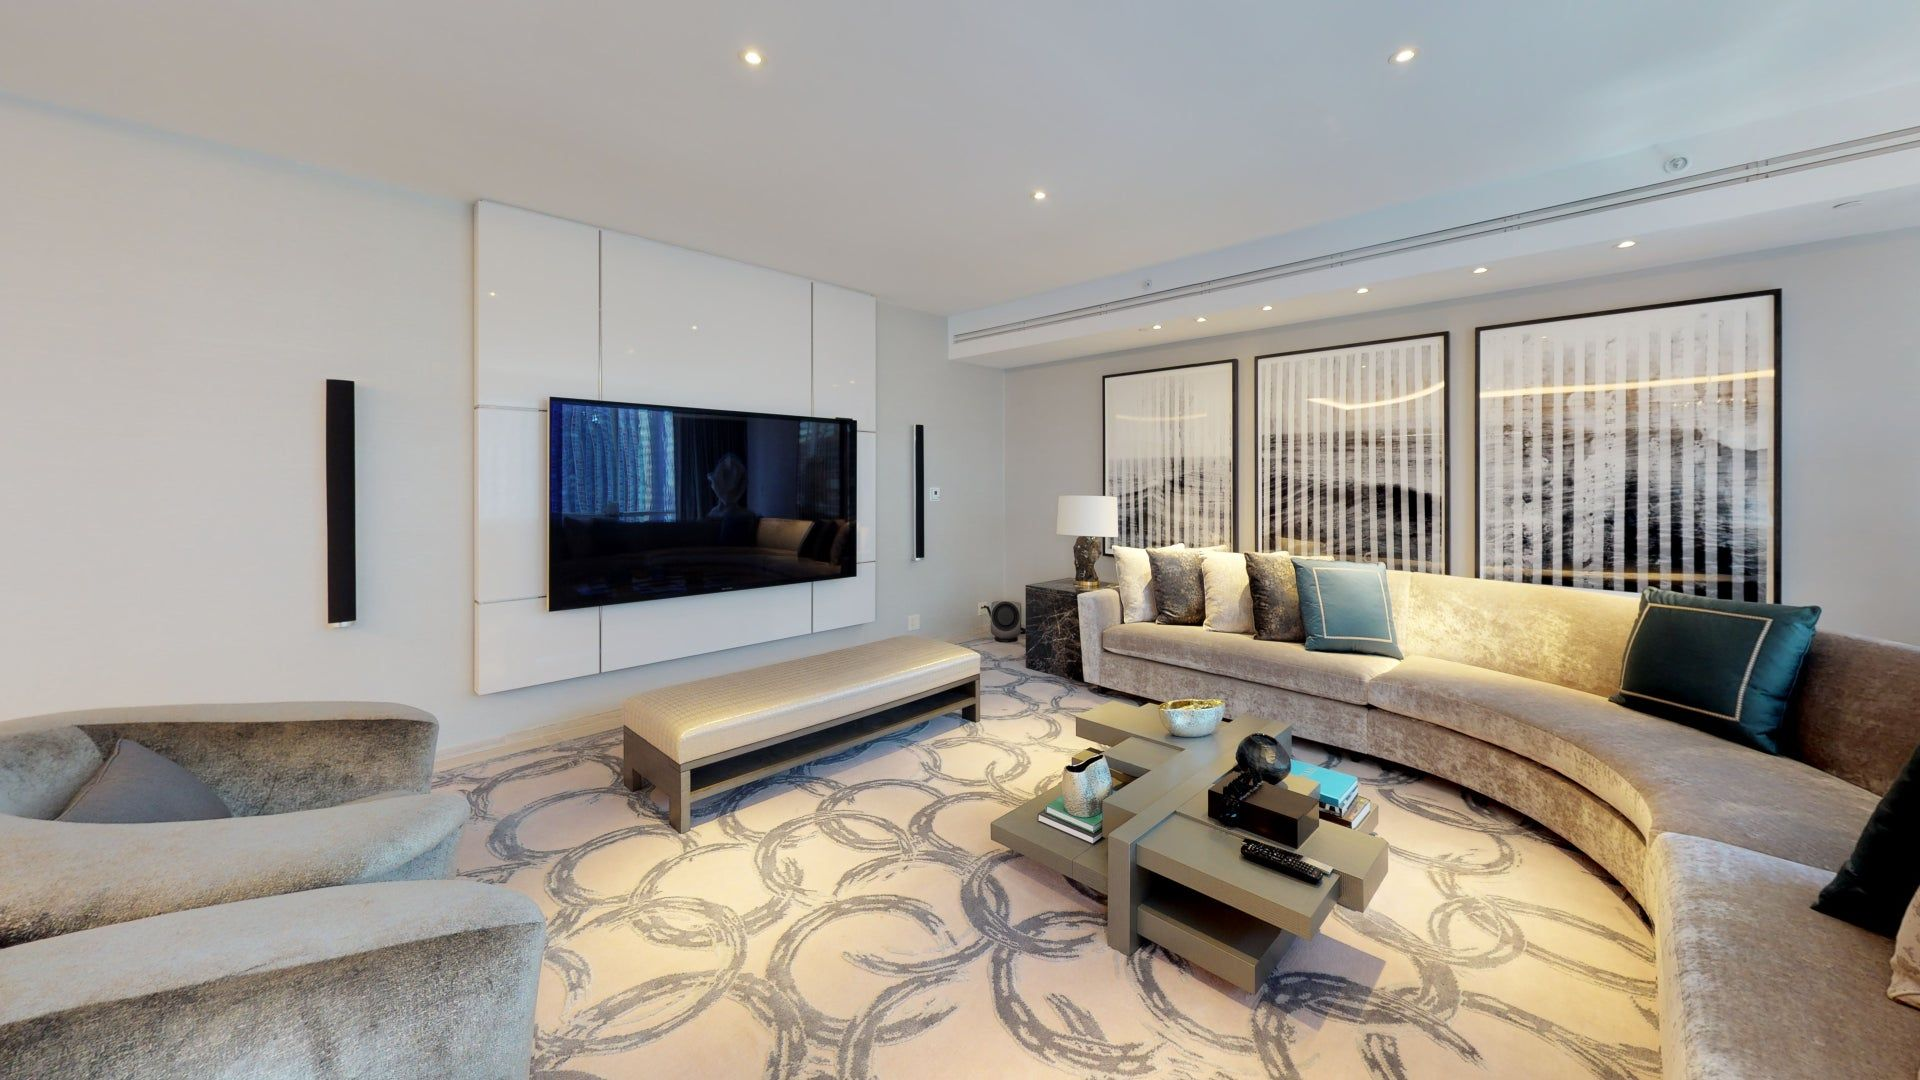 Park Hyatt New York Royal Suite Matterport 3d Showcase New York Penthouse Hotel Suite Luxury New York Hotels